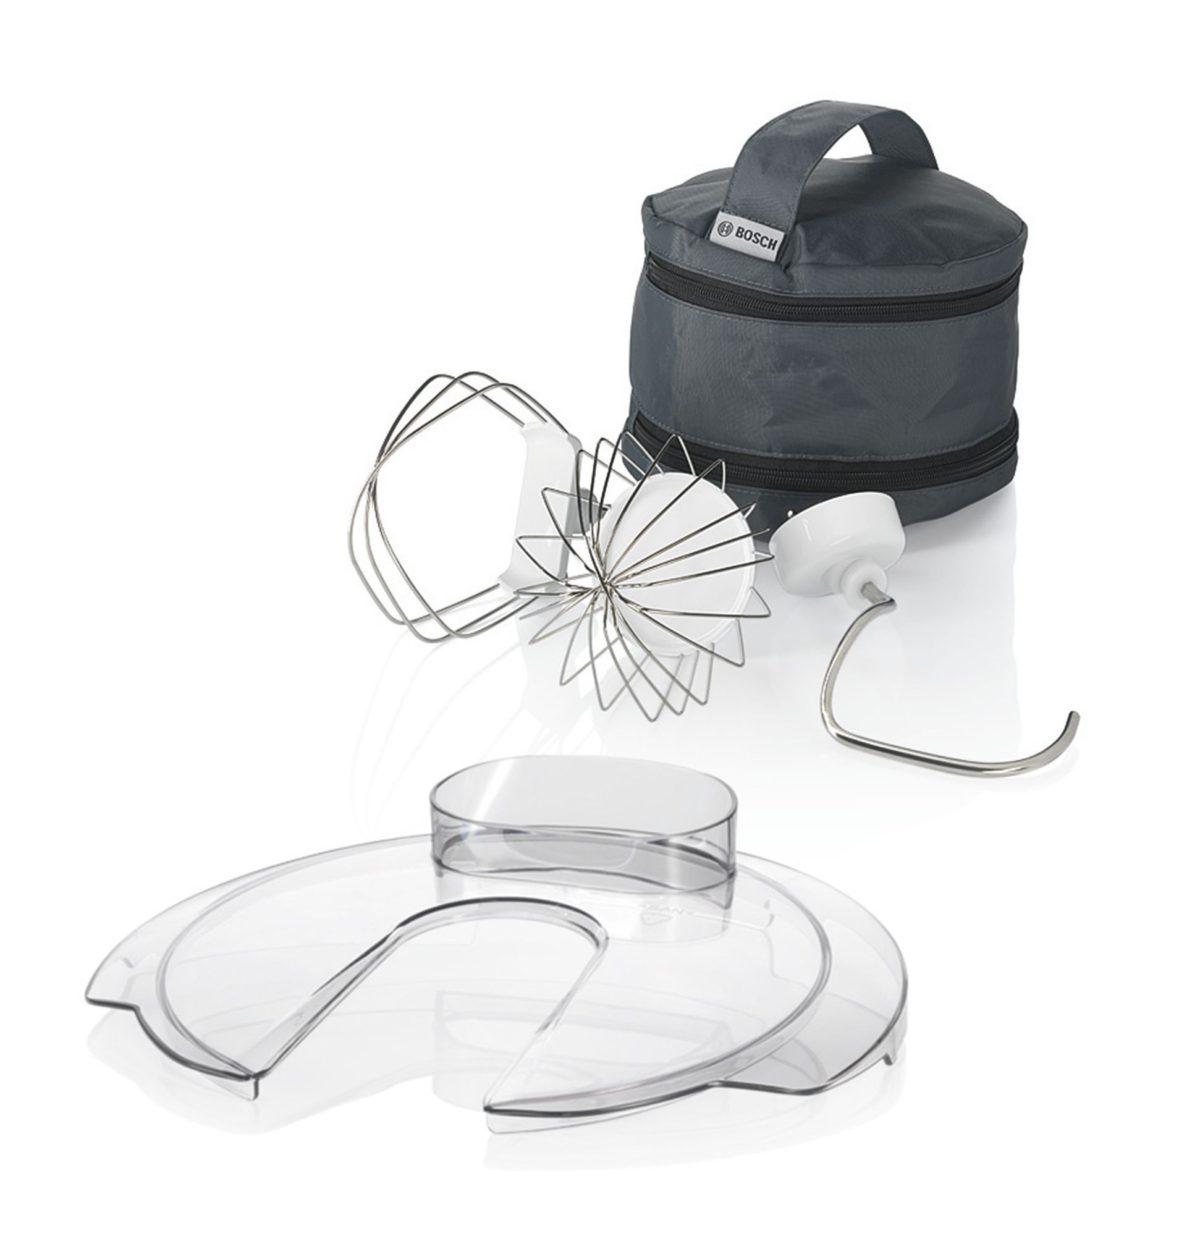 MCSA00930948 BO U 50 UZ1 MUZ5 productshot noKF accessorybag black ENG 011214 def 1200x1236 - Robot de bucatarie Bosch, MUM5 700 W Alb, MUM52120